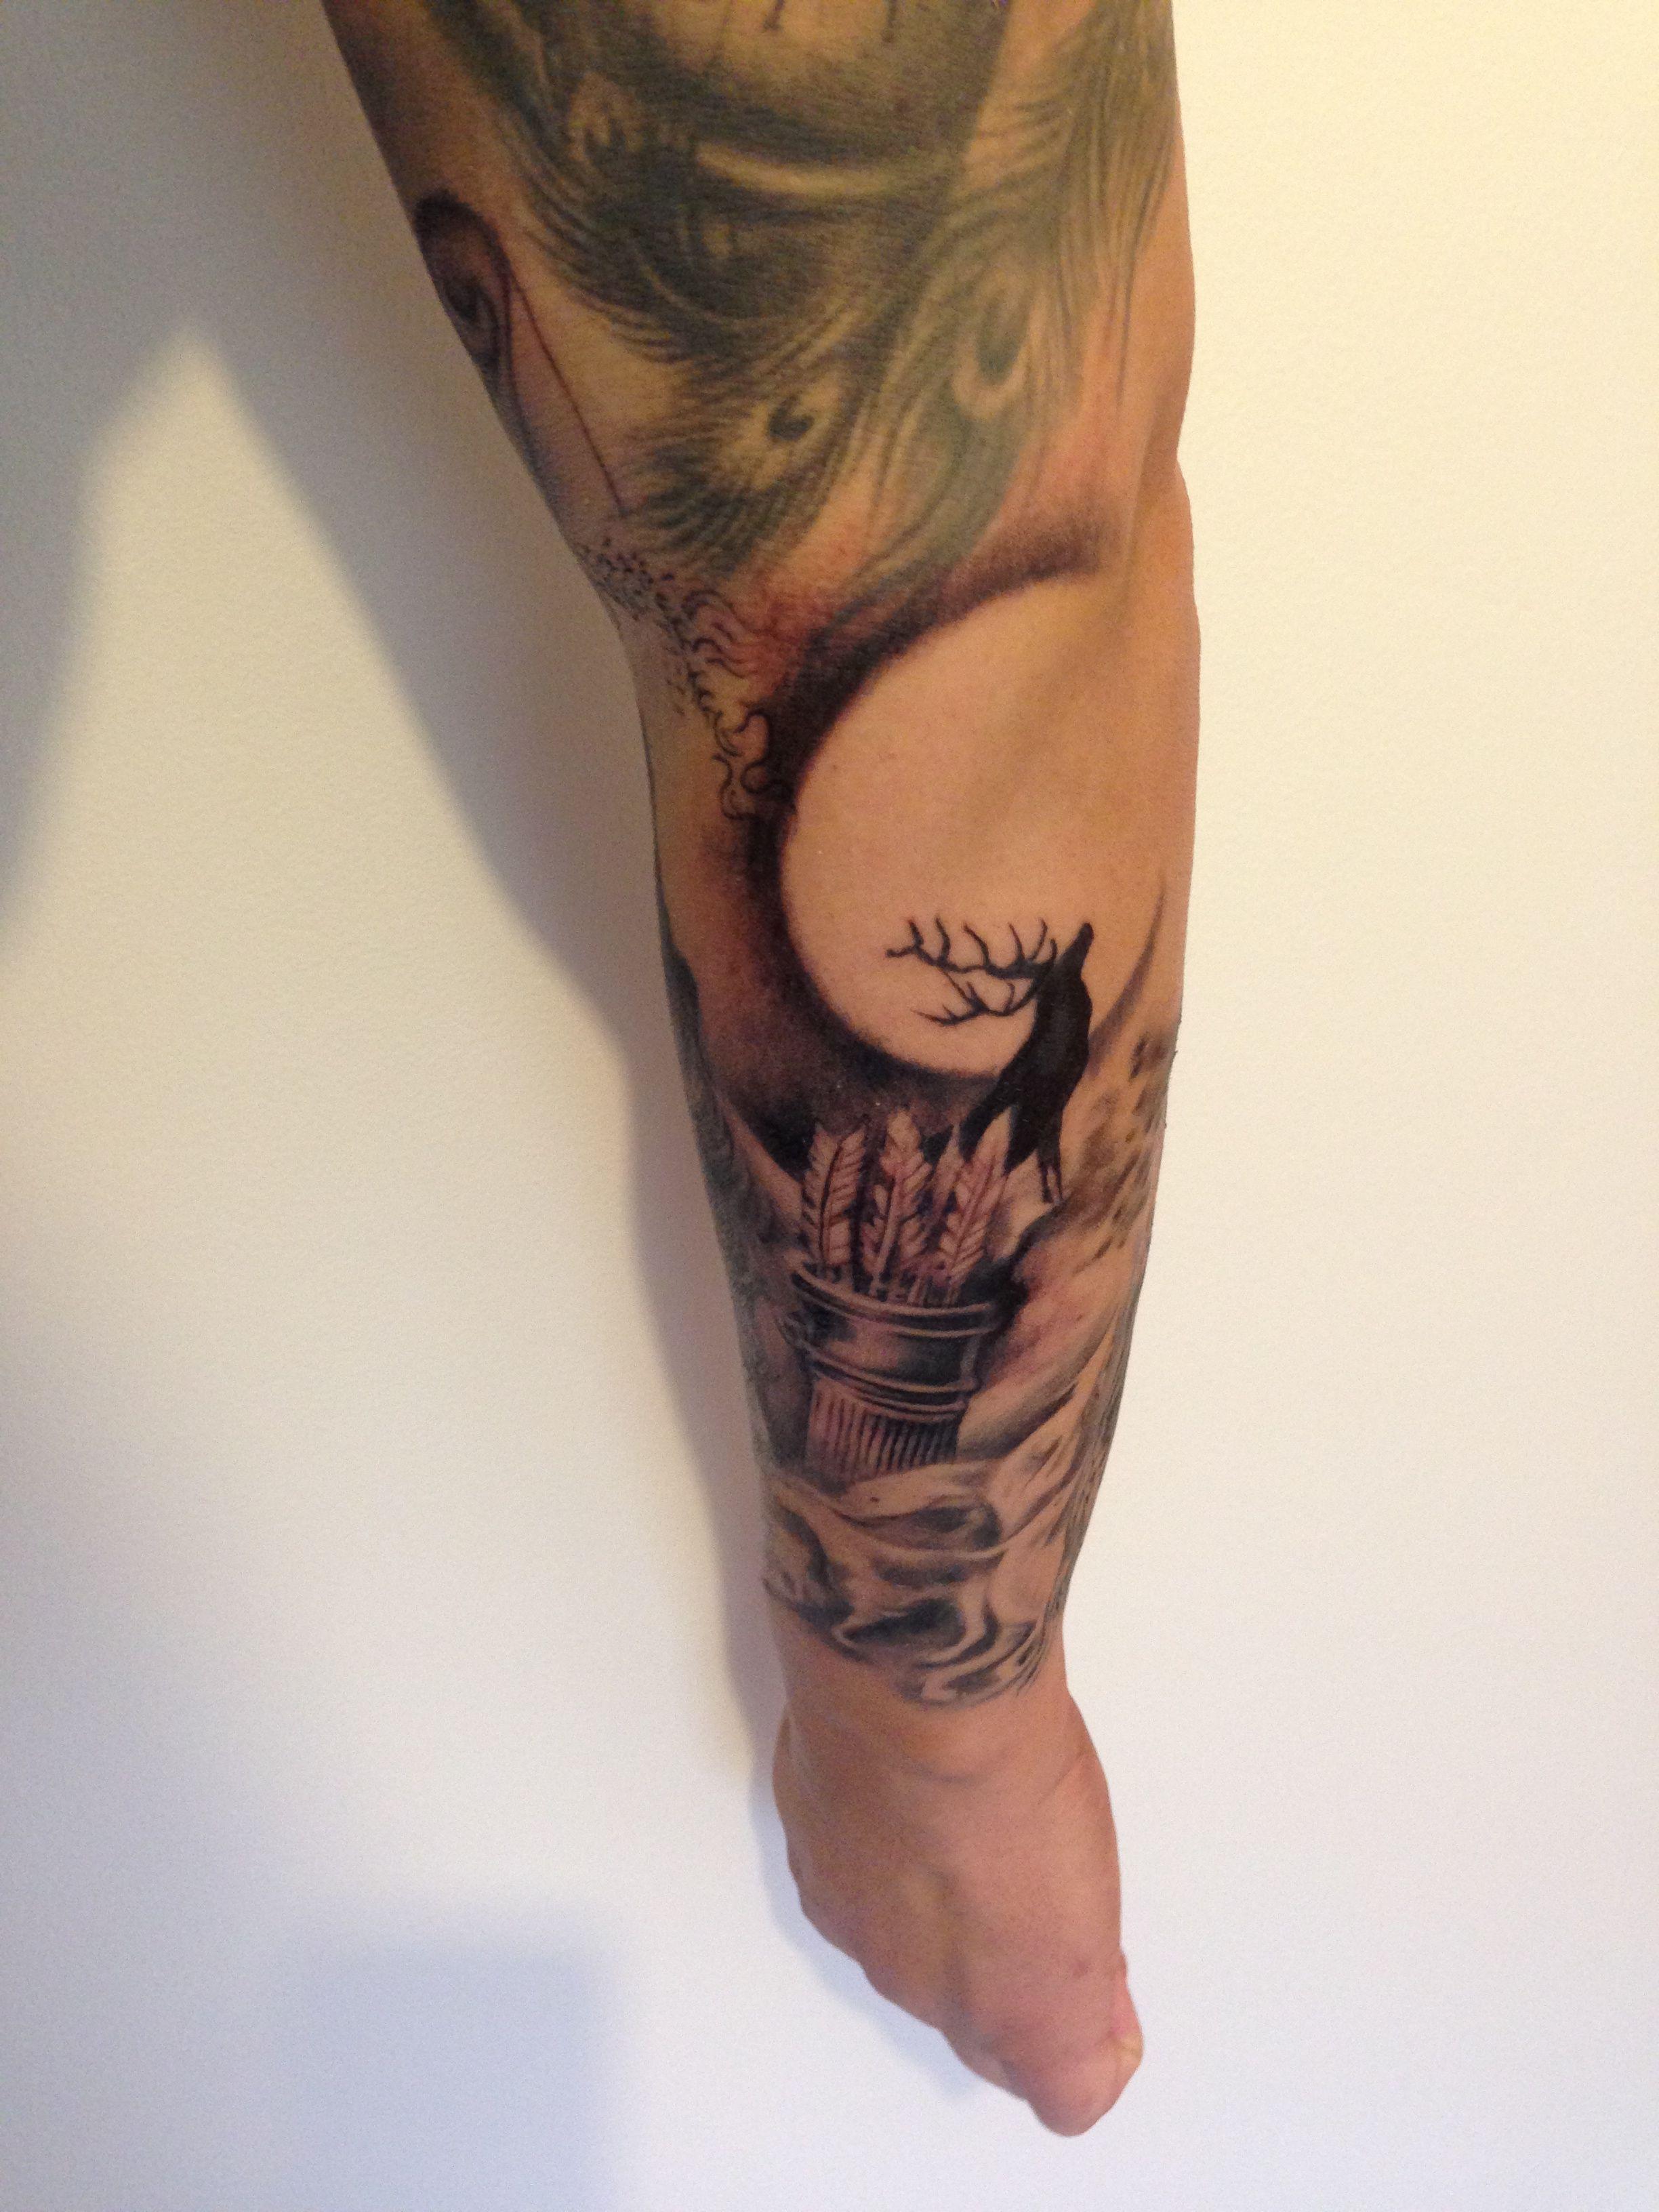 Goddess Spine Tattoo: Behind Artemis, Goddess Of The Hunt, Wild Animals And